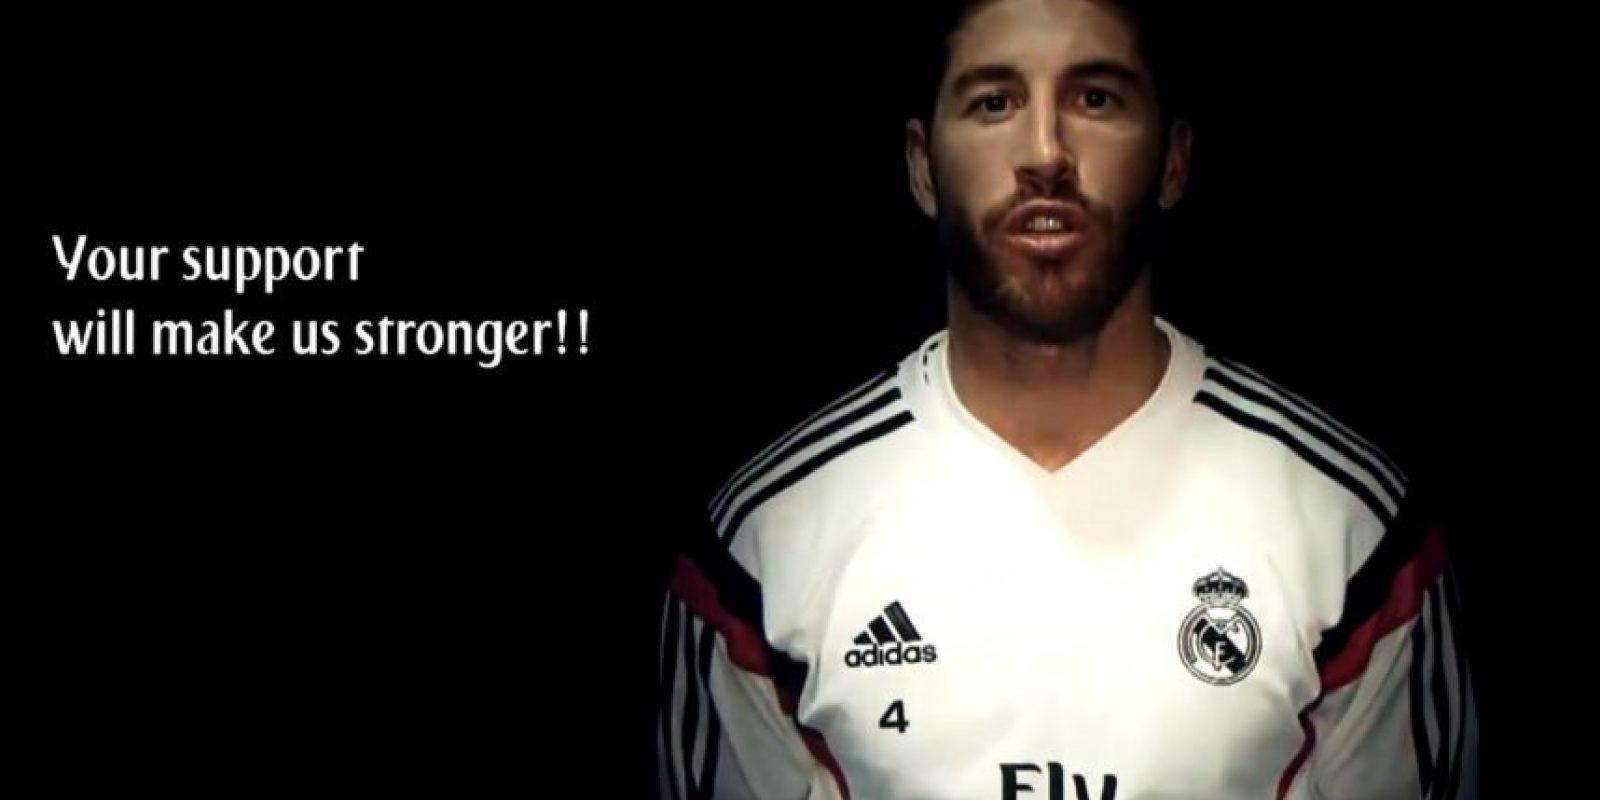 El español Sergio Ramos Foto:Youtube: ToreTToHDTV